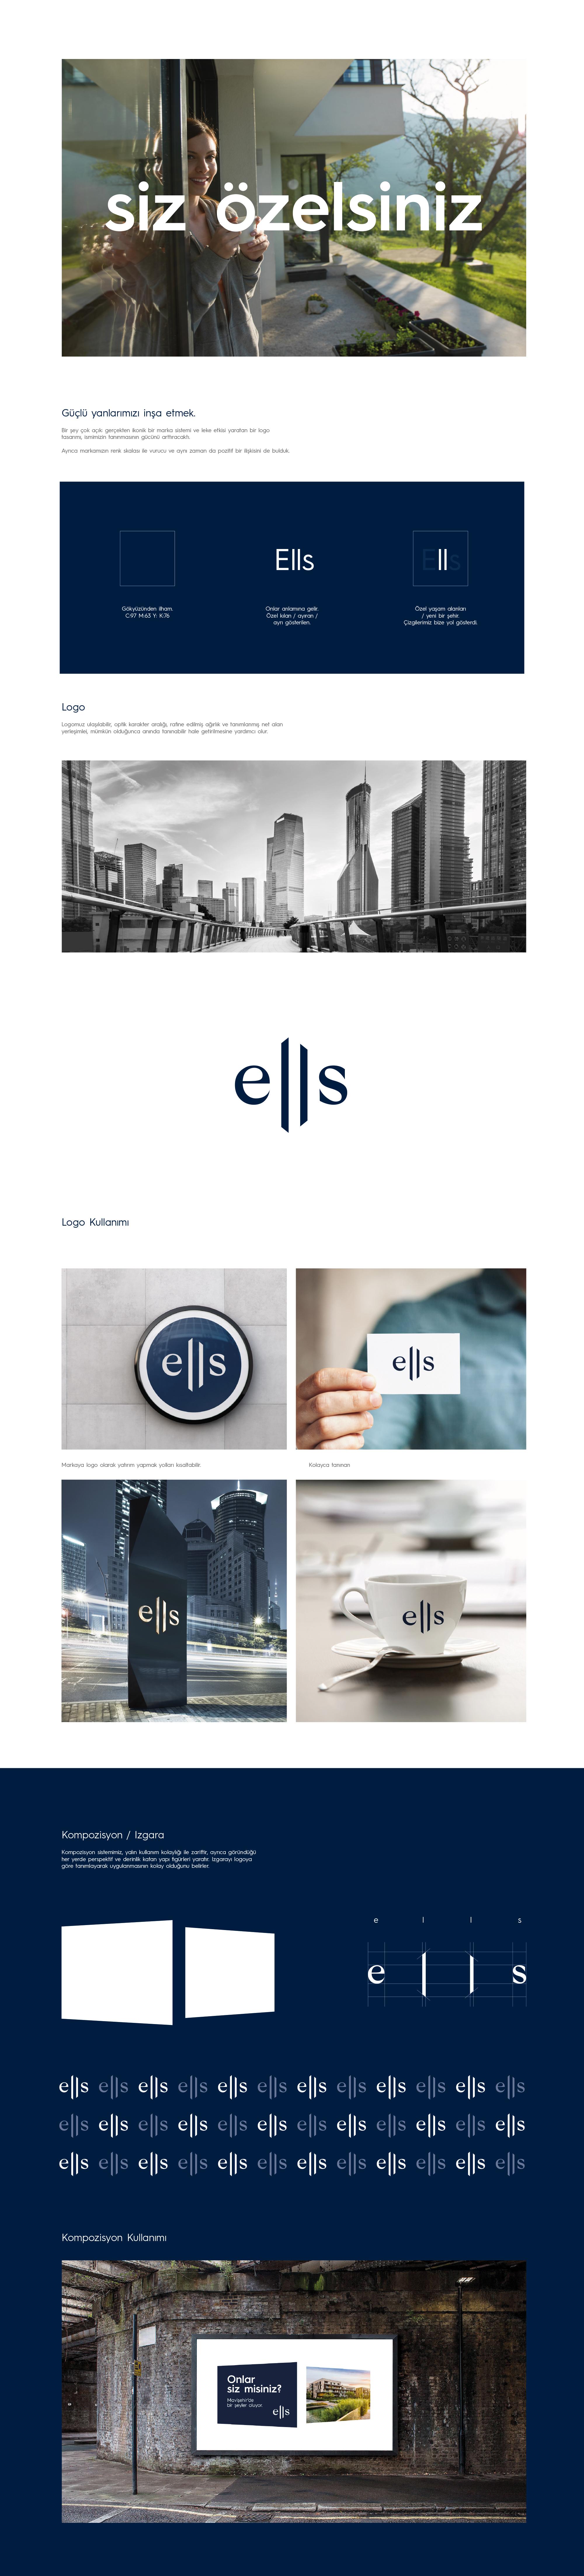 Ankara kurumsal kimlik tasarımı  Ells